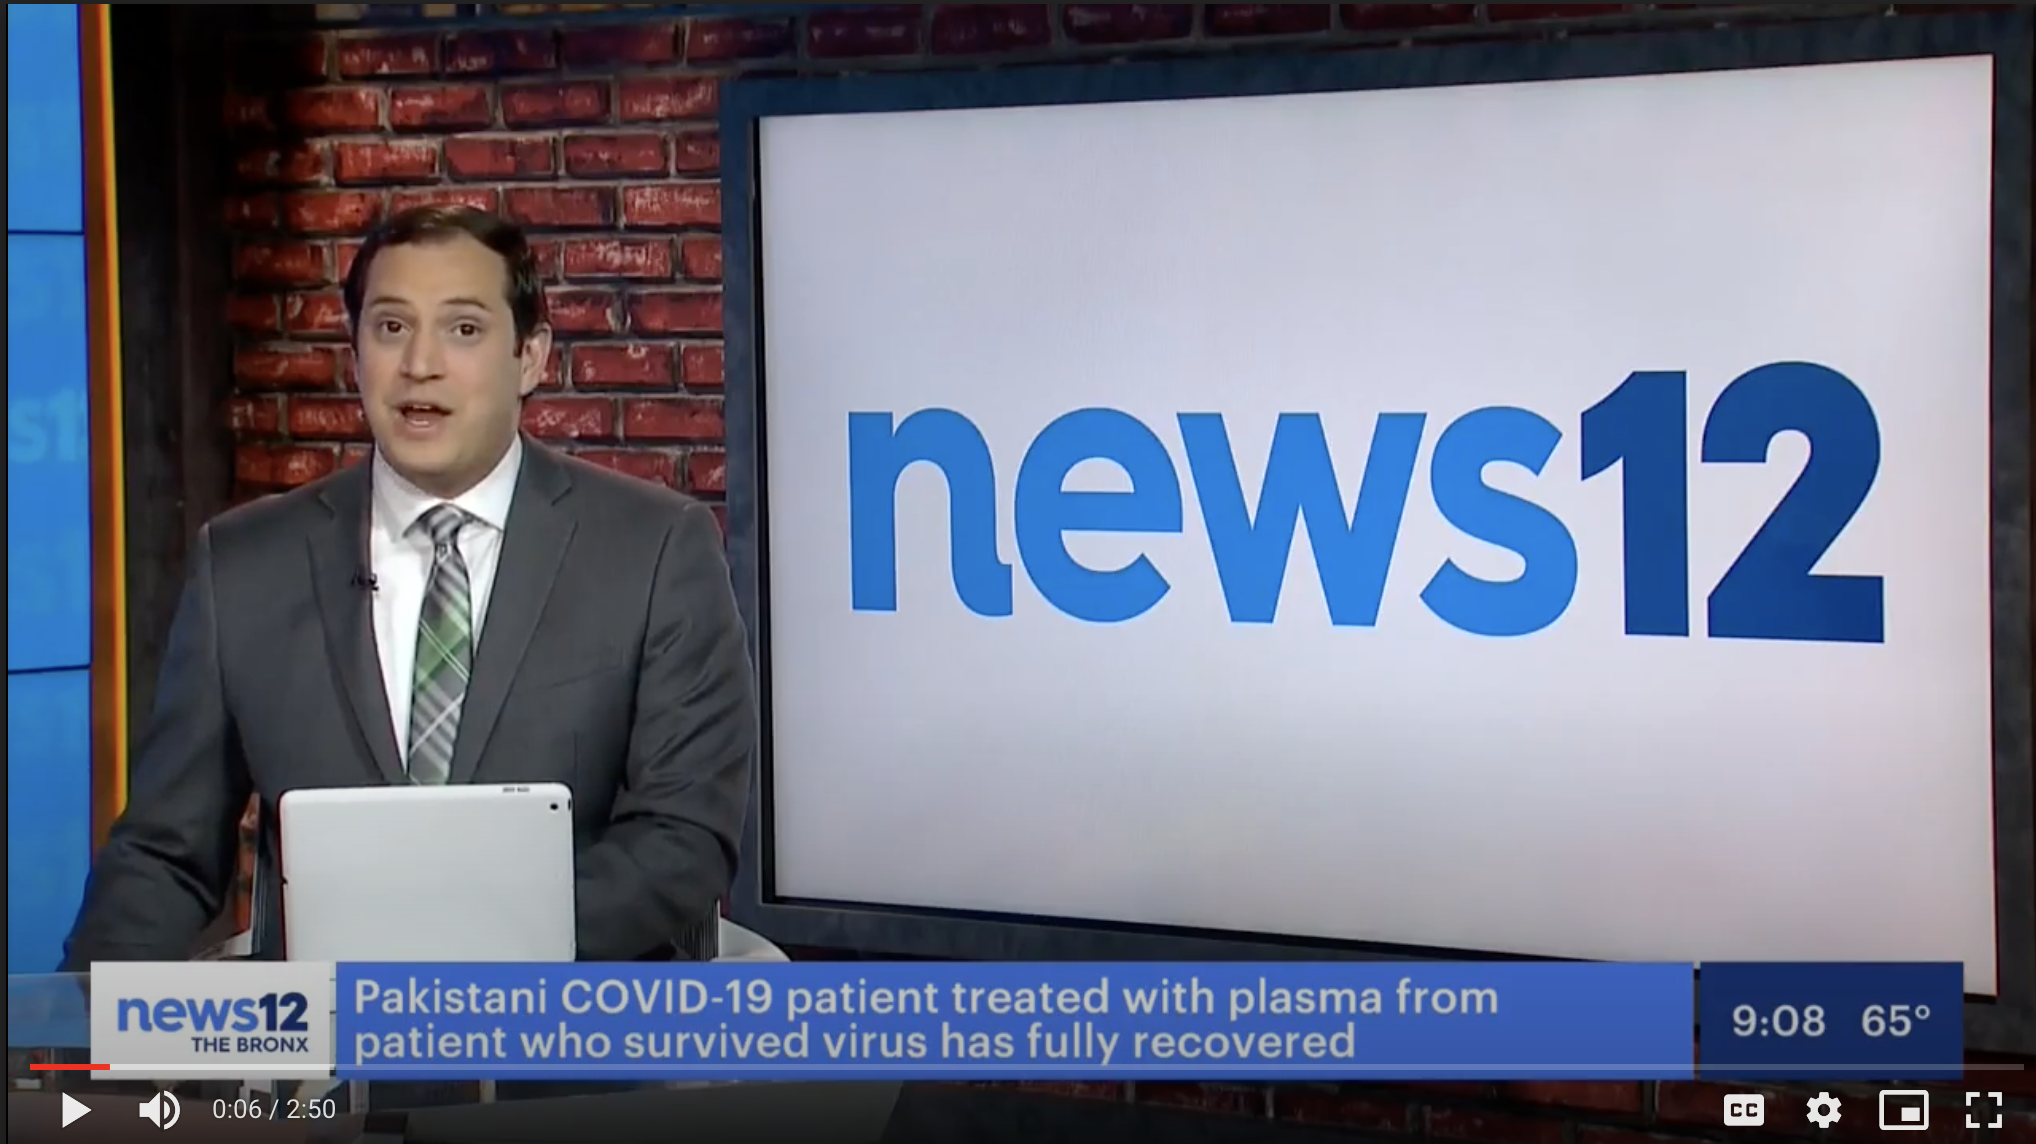 News 12 Report